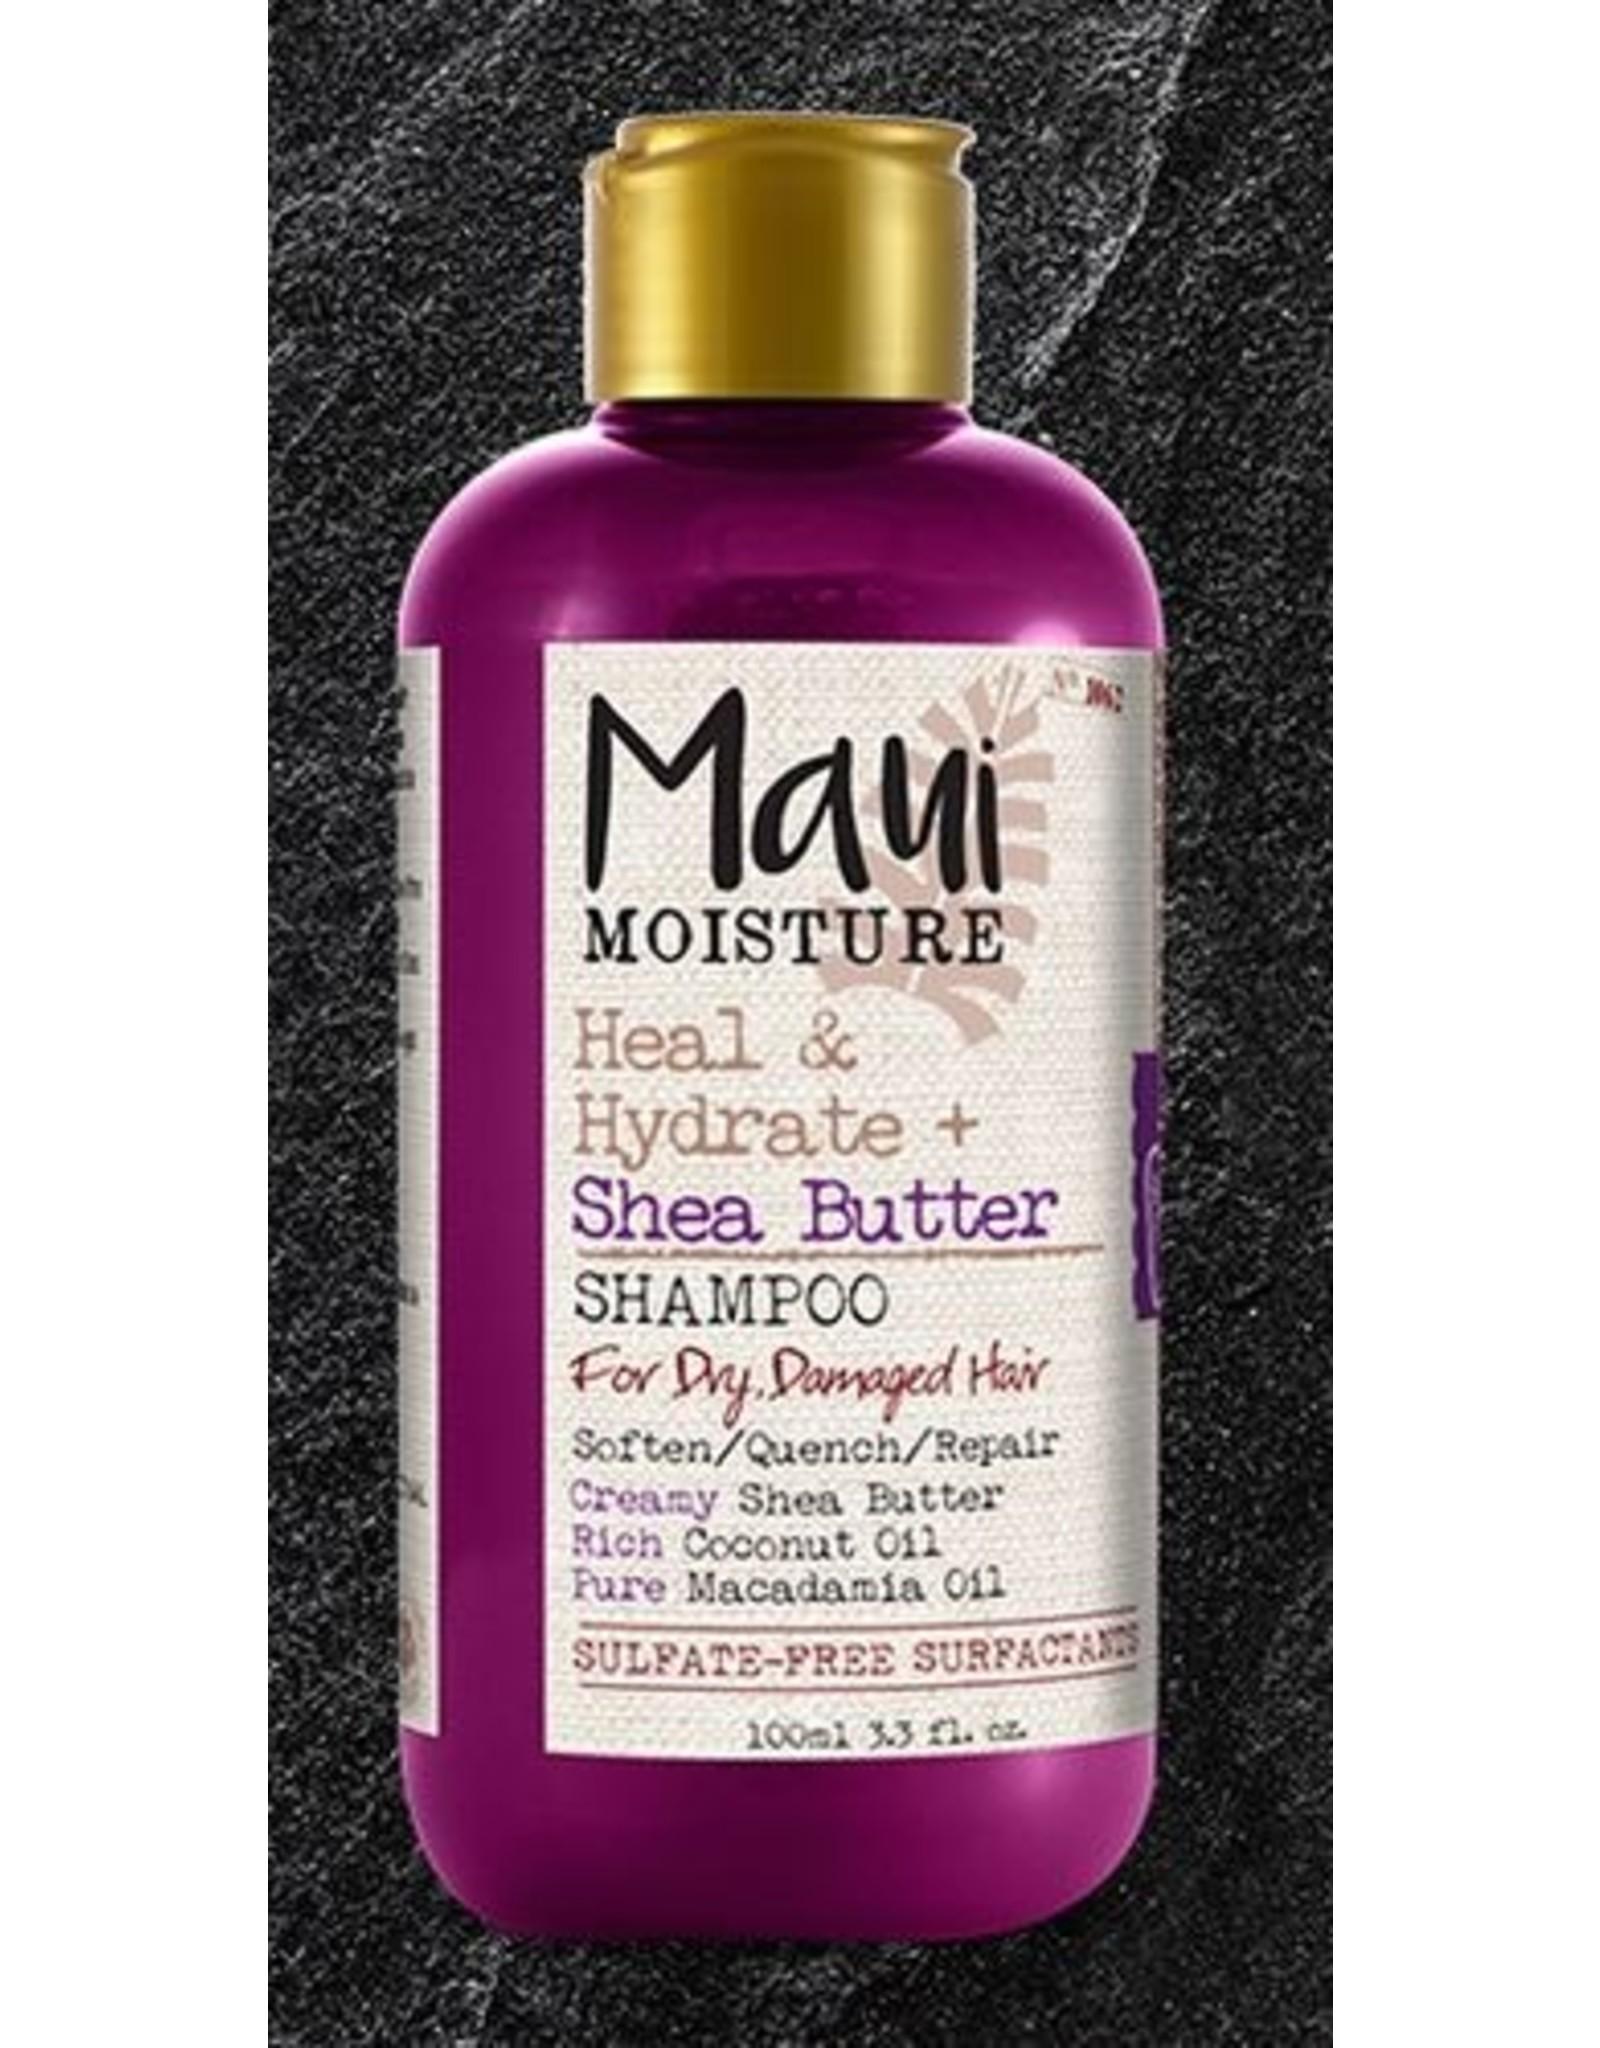 Maui Moisture 100ml Shampoo Vegan Friendly